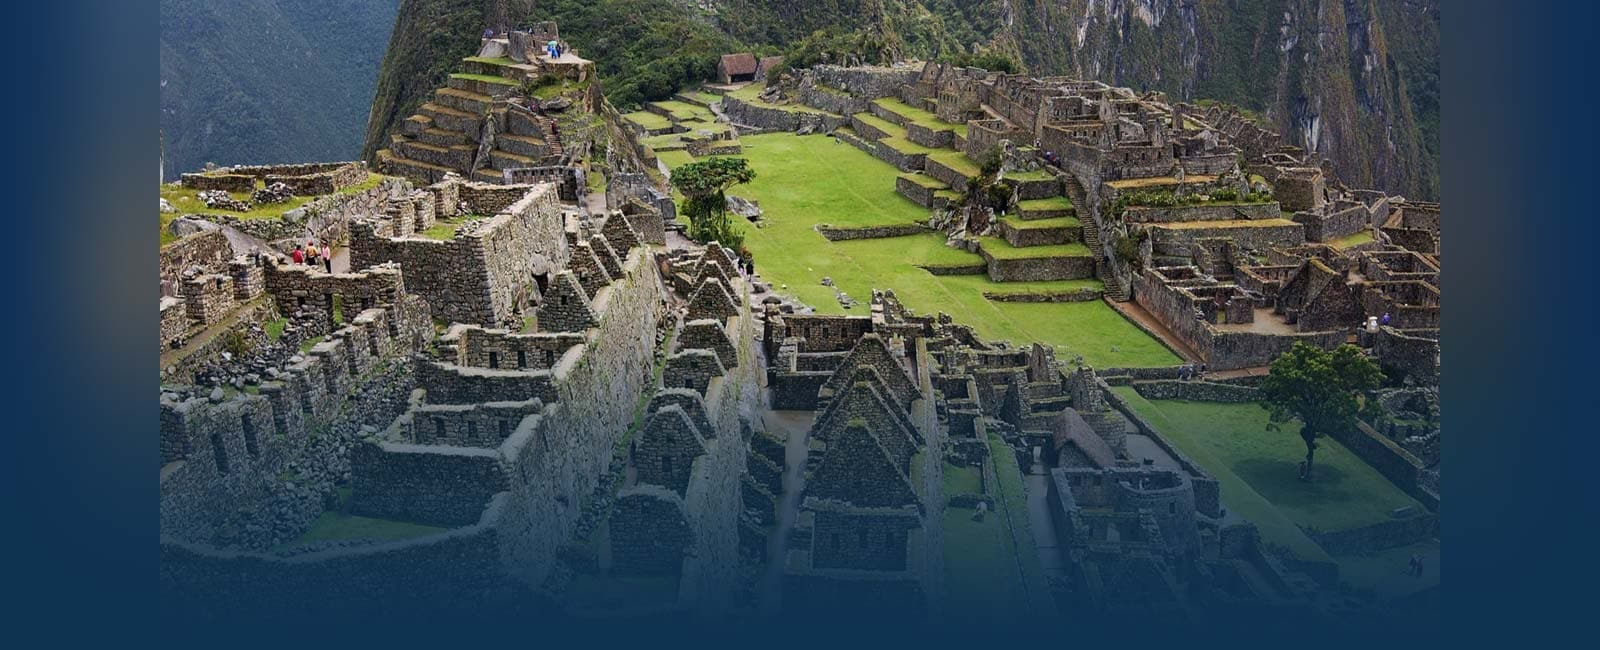 South America Cruises Amazon Cruises Princess Cruises - Cruise to south america